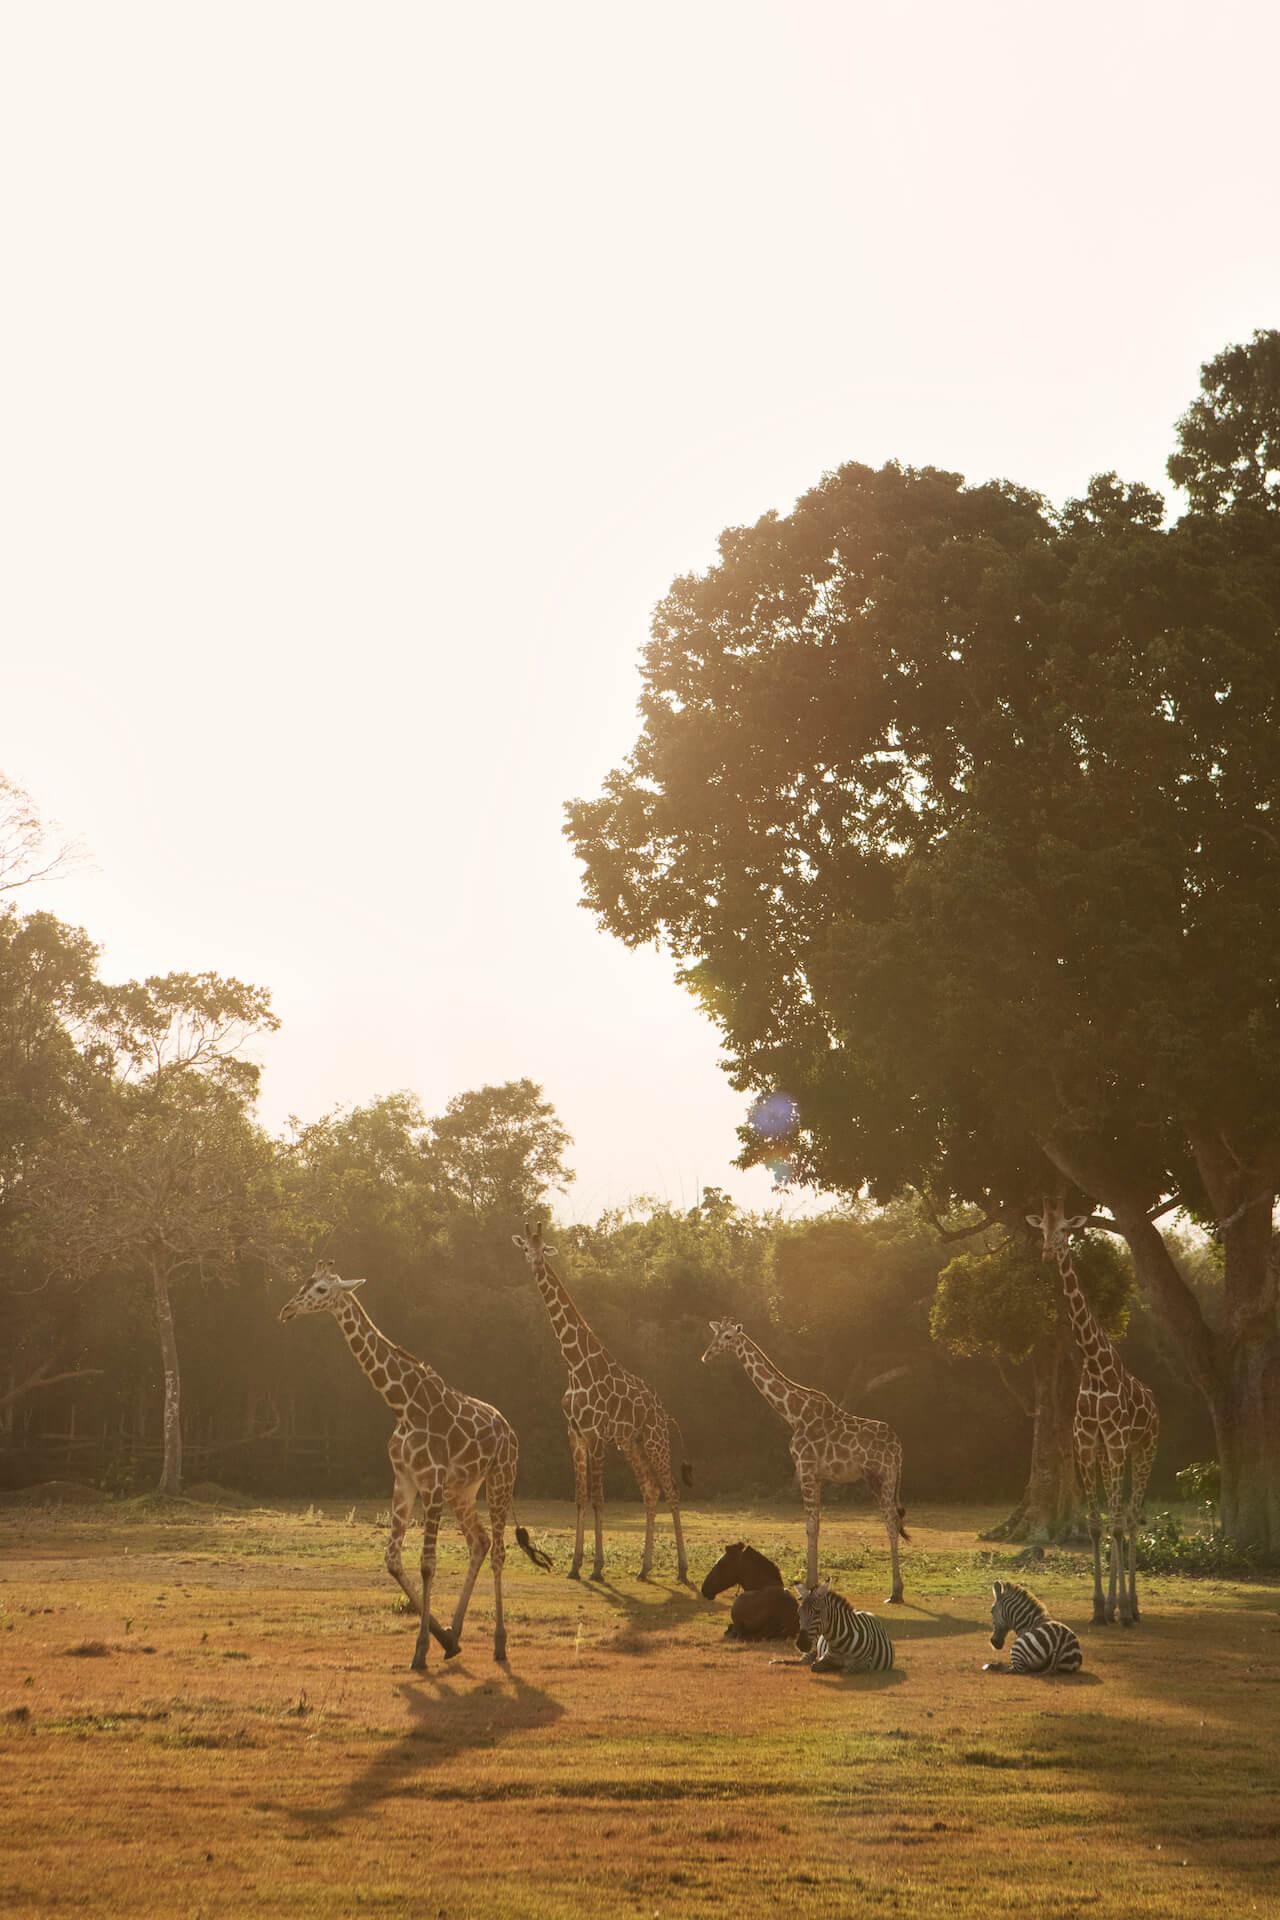 Giraffes, Zebras and a horse in Calauit Safari Park